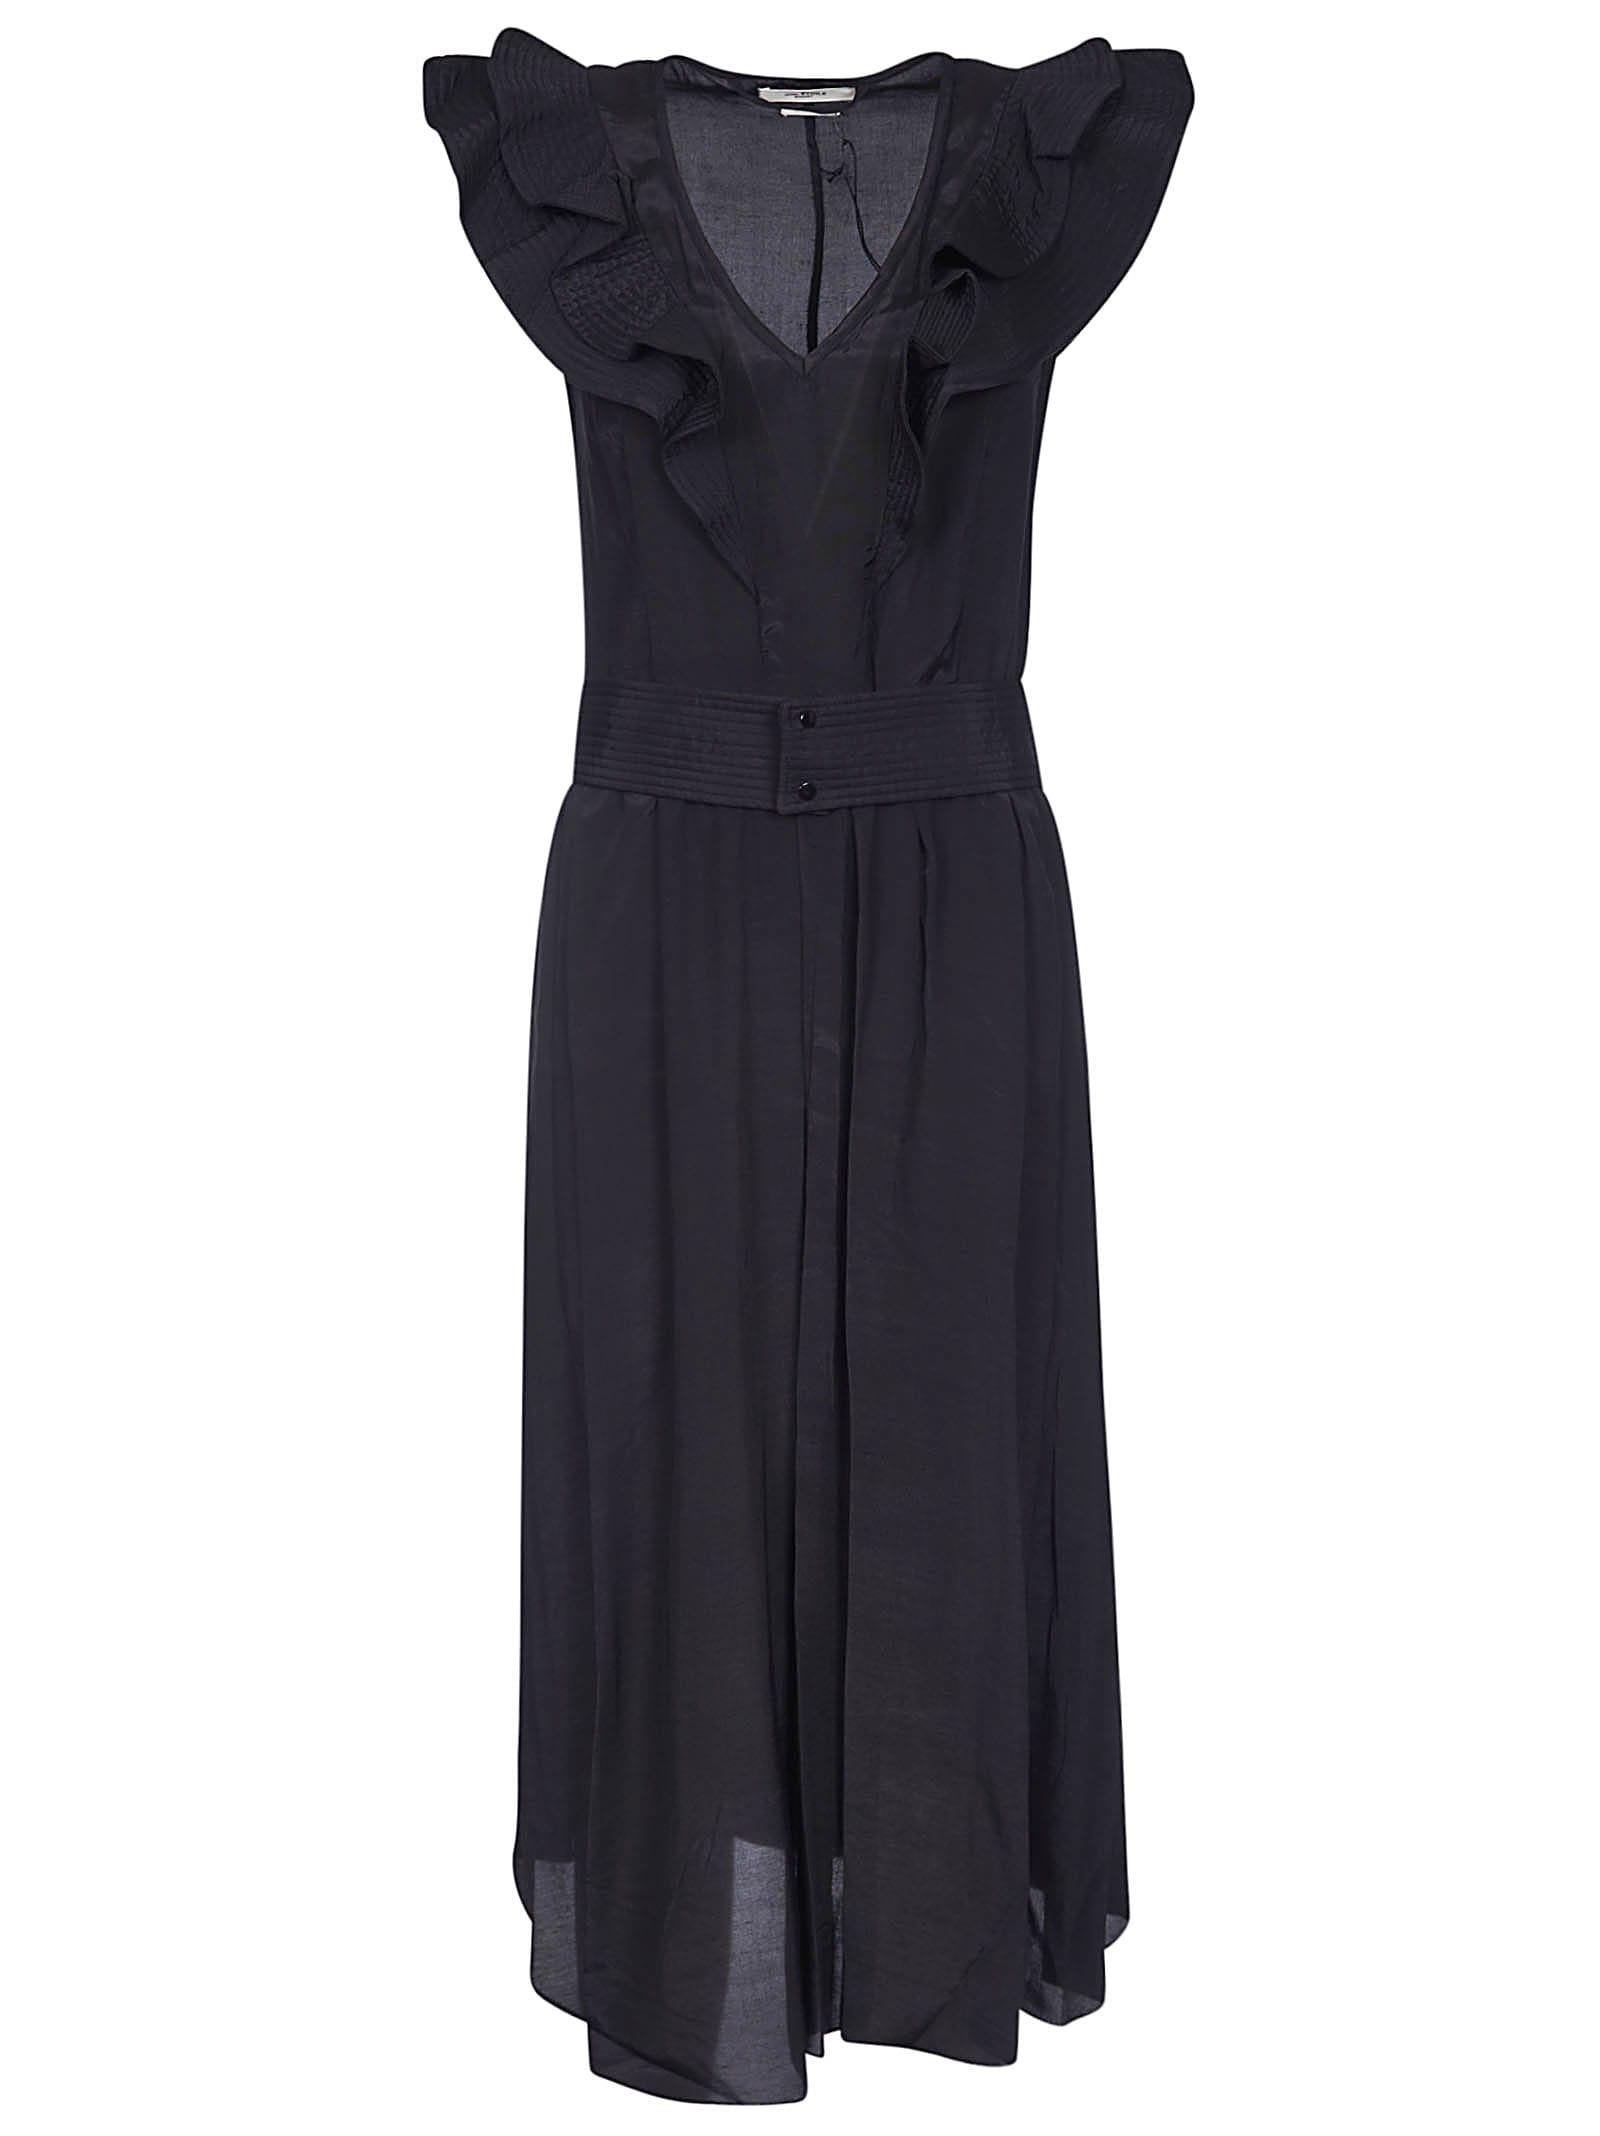 Buy Isabel Marant Coraline Dress online, shop Isabel Marant with free shipping